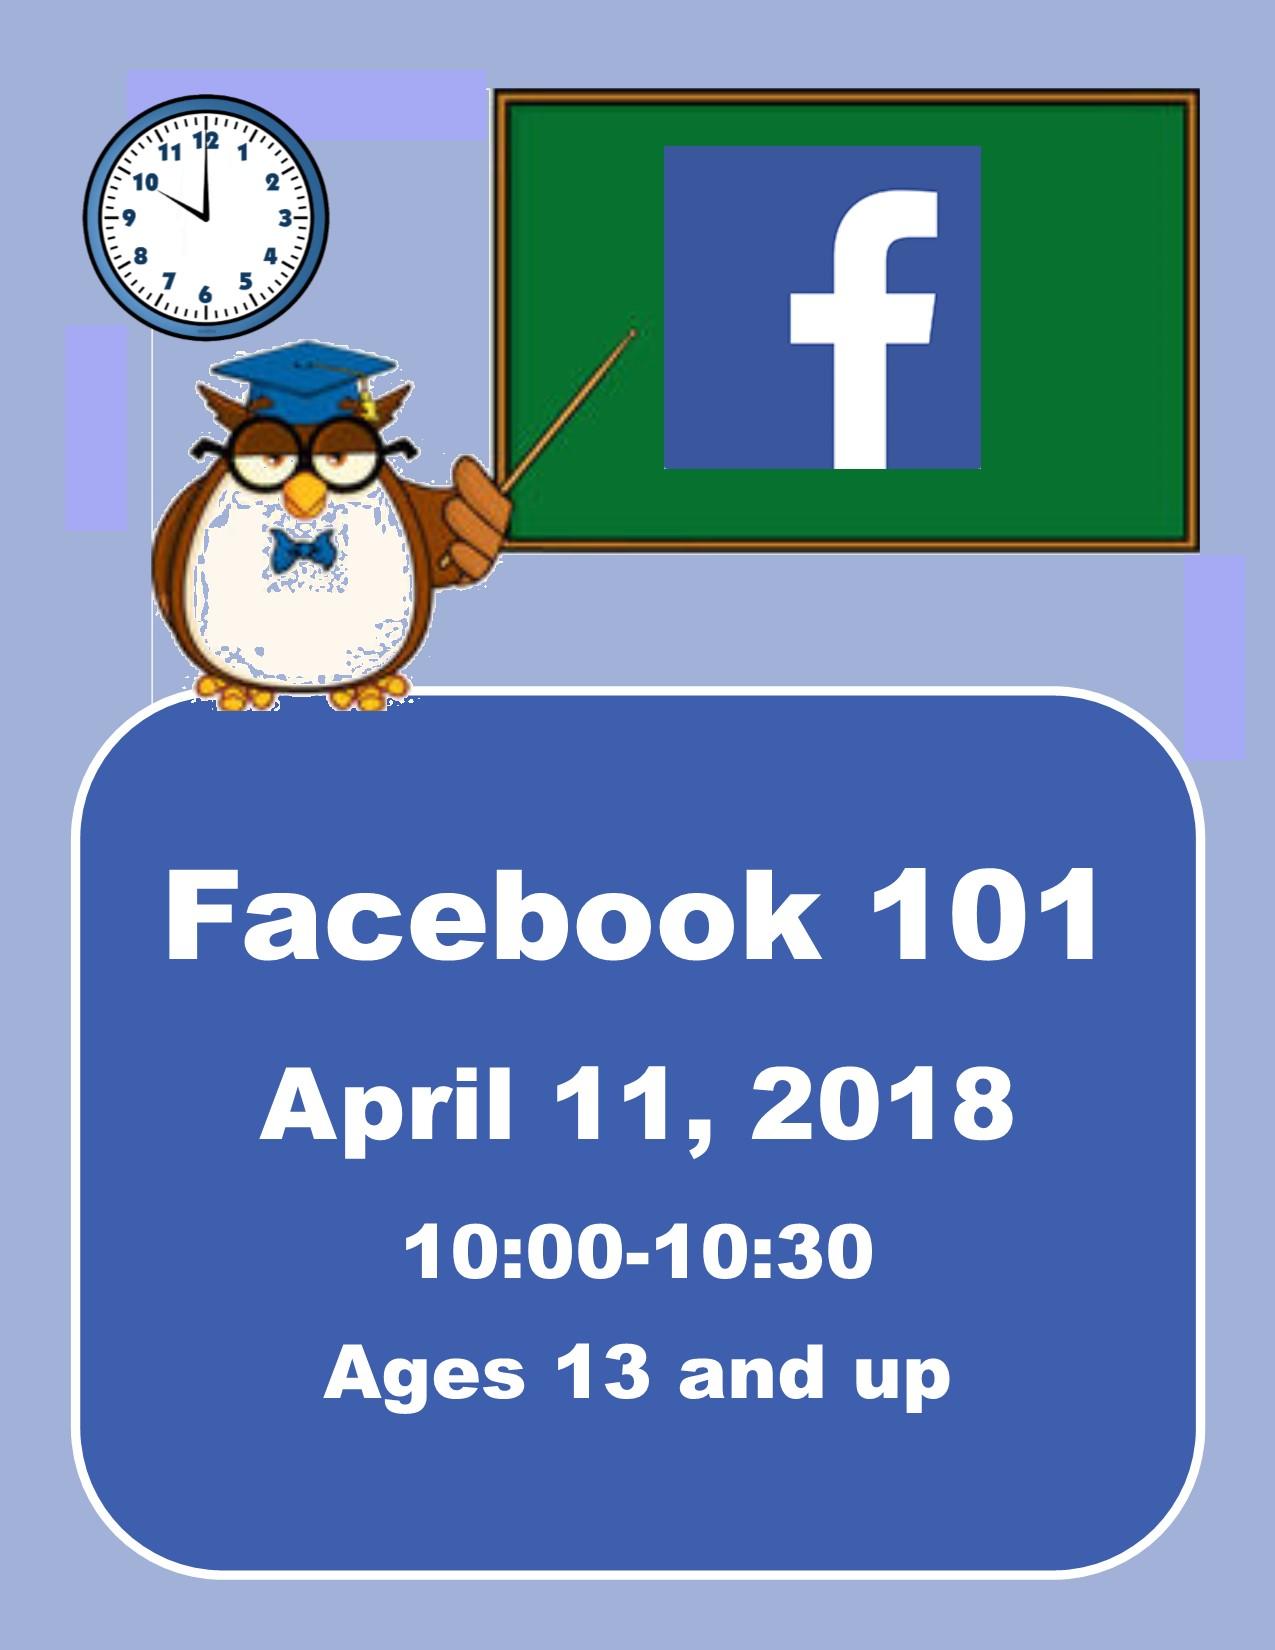 Facebook 101 | Master Events Calendar | Nashville, NC